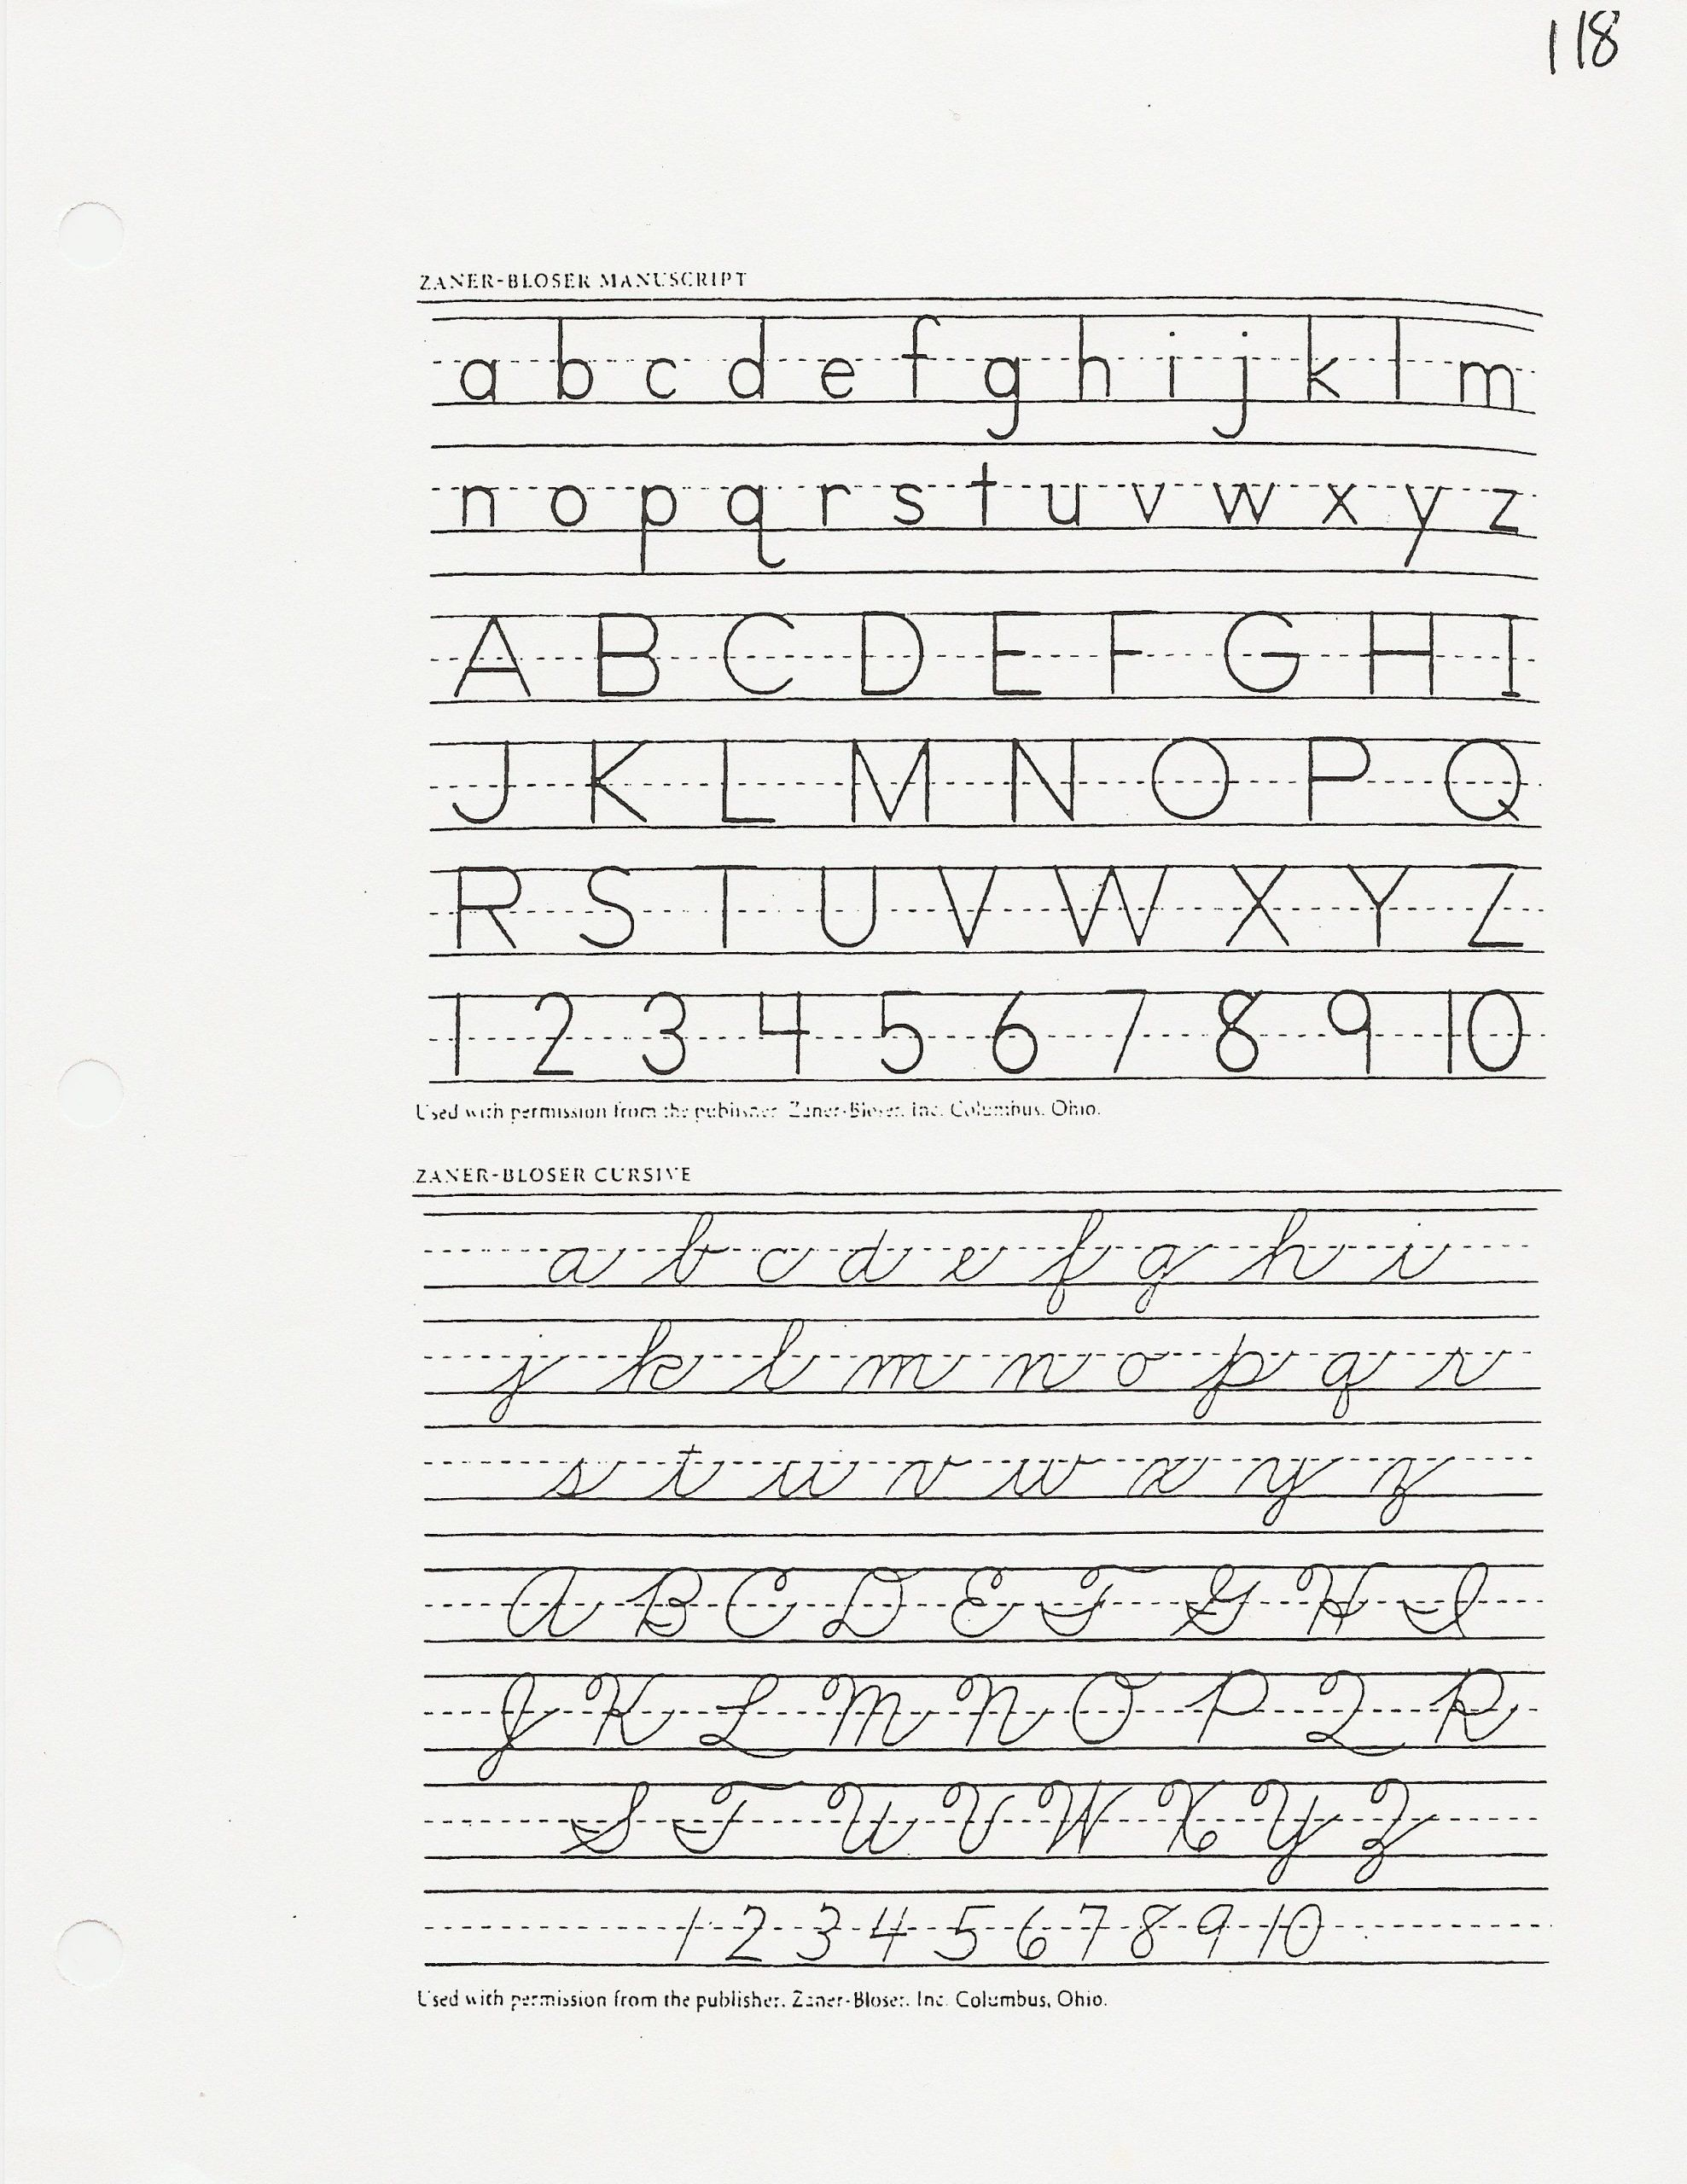 Zaner Bloser Handwriting Worksheets Zaner Bloser Handwriting Writing Sentences Worksheets Cursive Worksheets Cursive Writing Practice Sheets